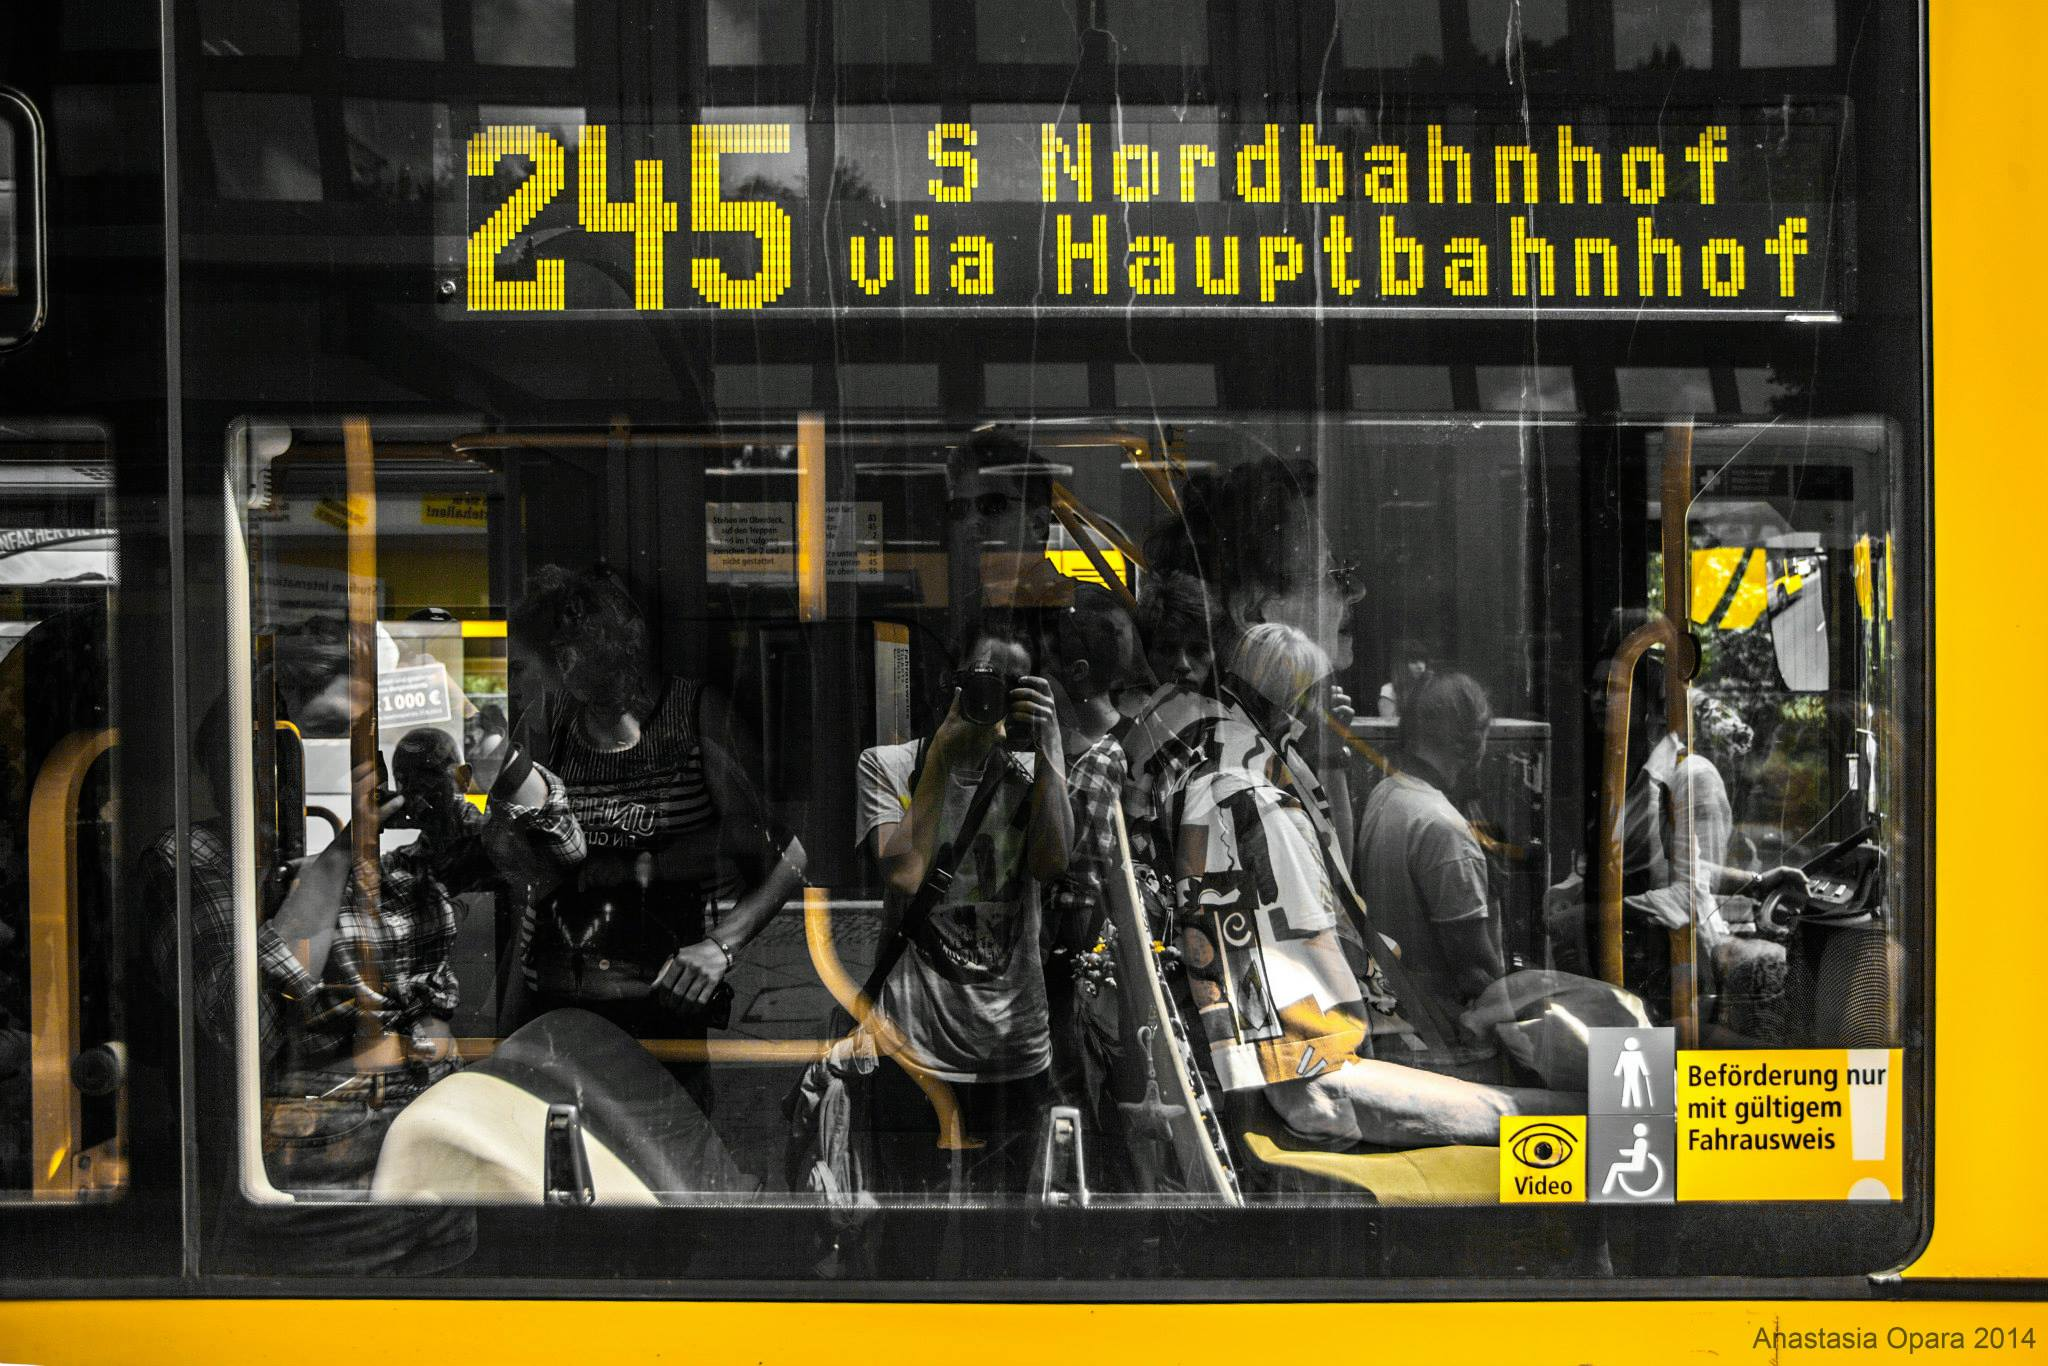 BERLIN'14